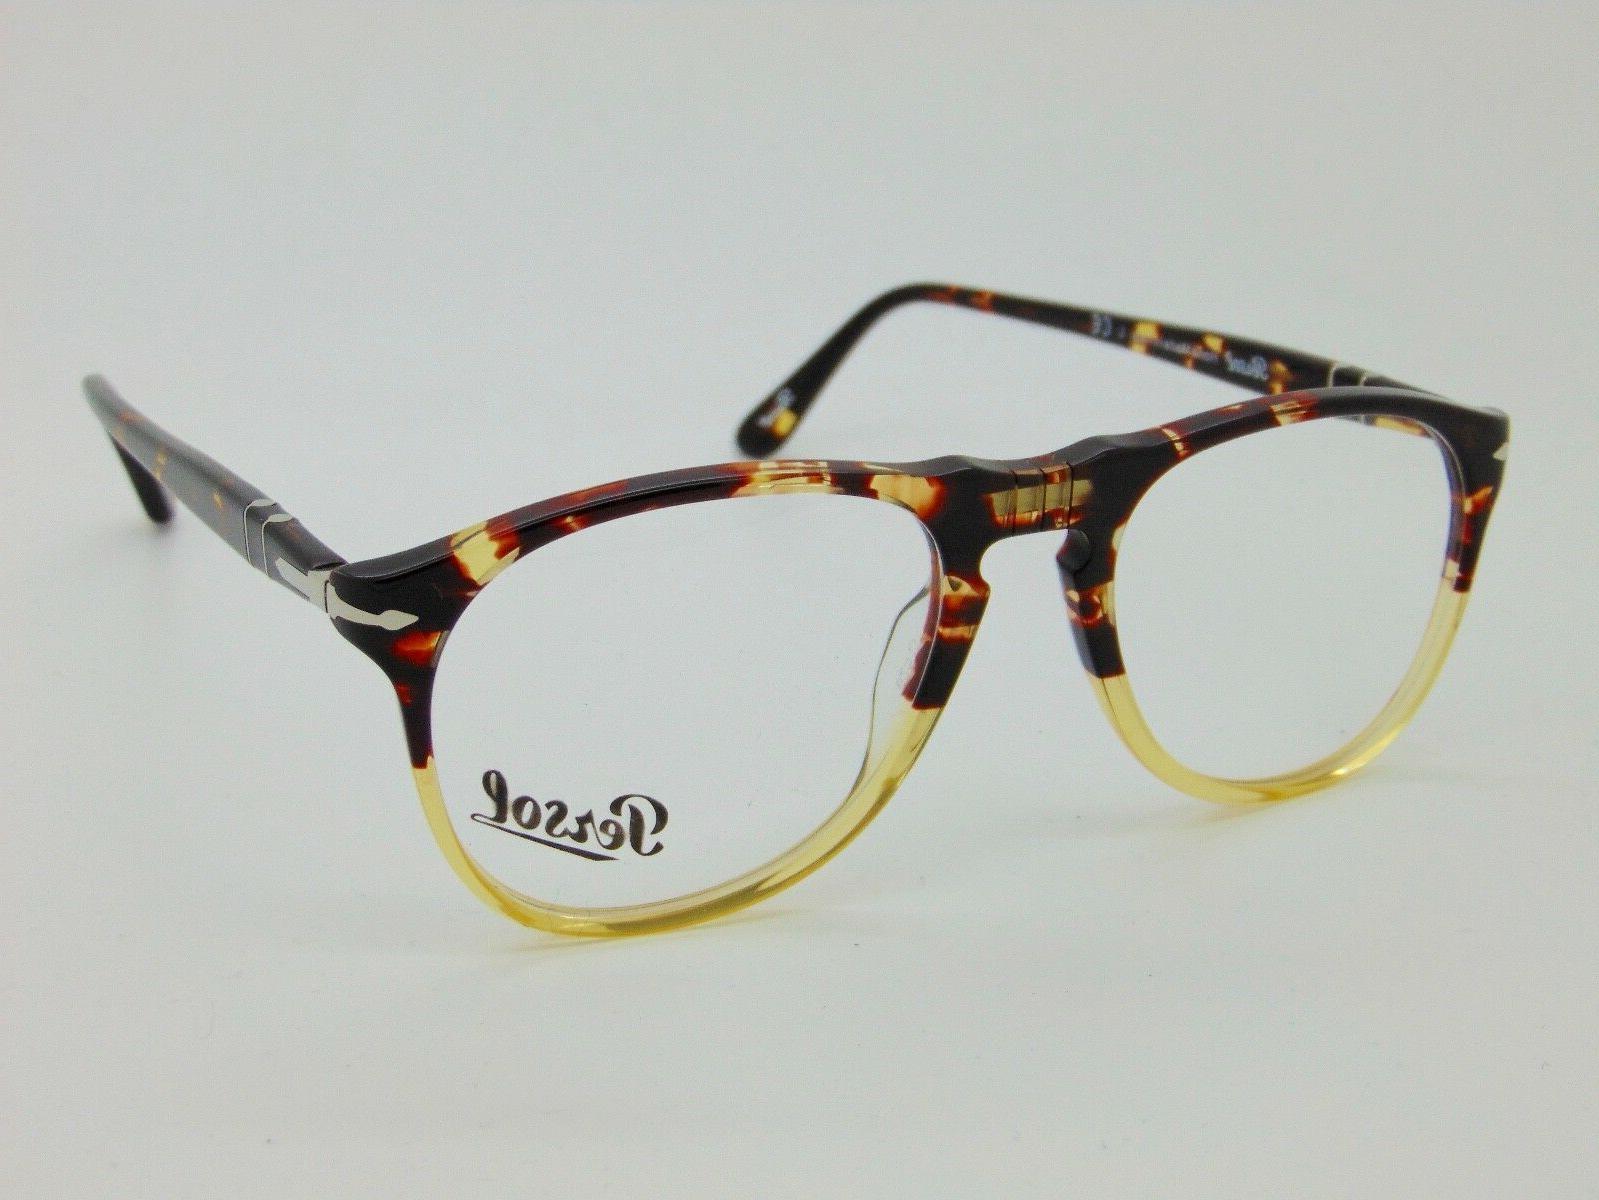 New 1024 Ebano Aviator 52mm RX Eyeglasses